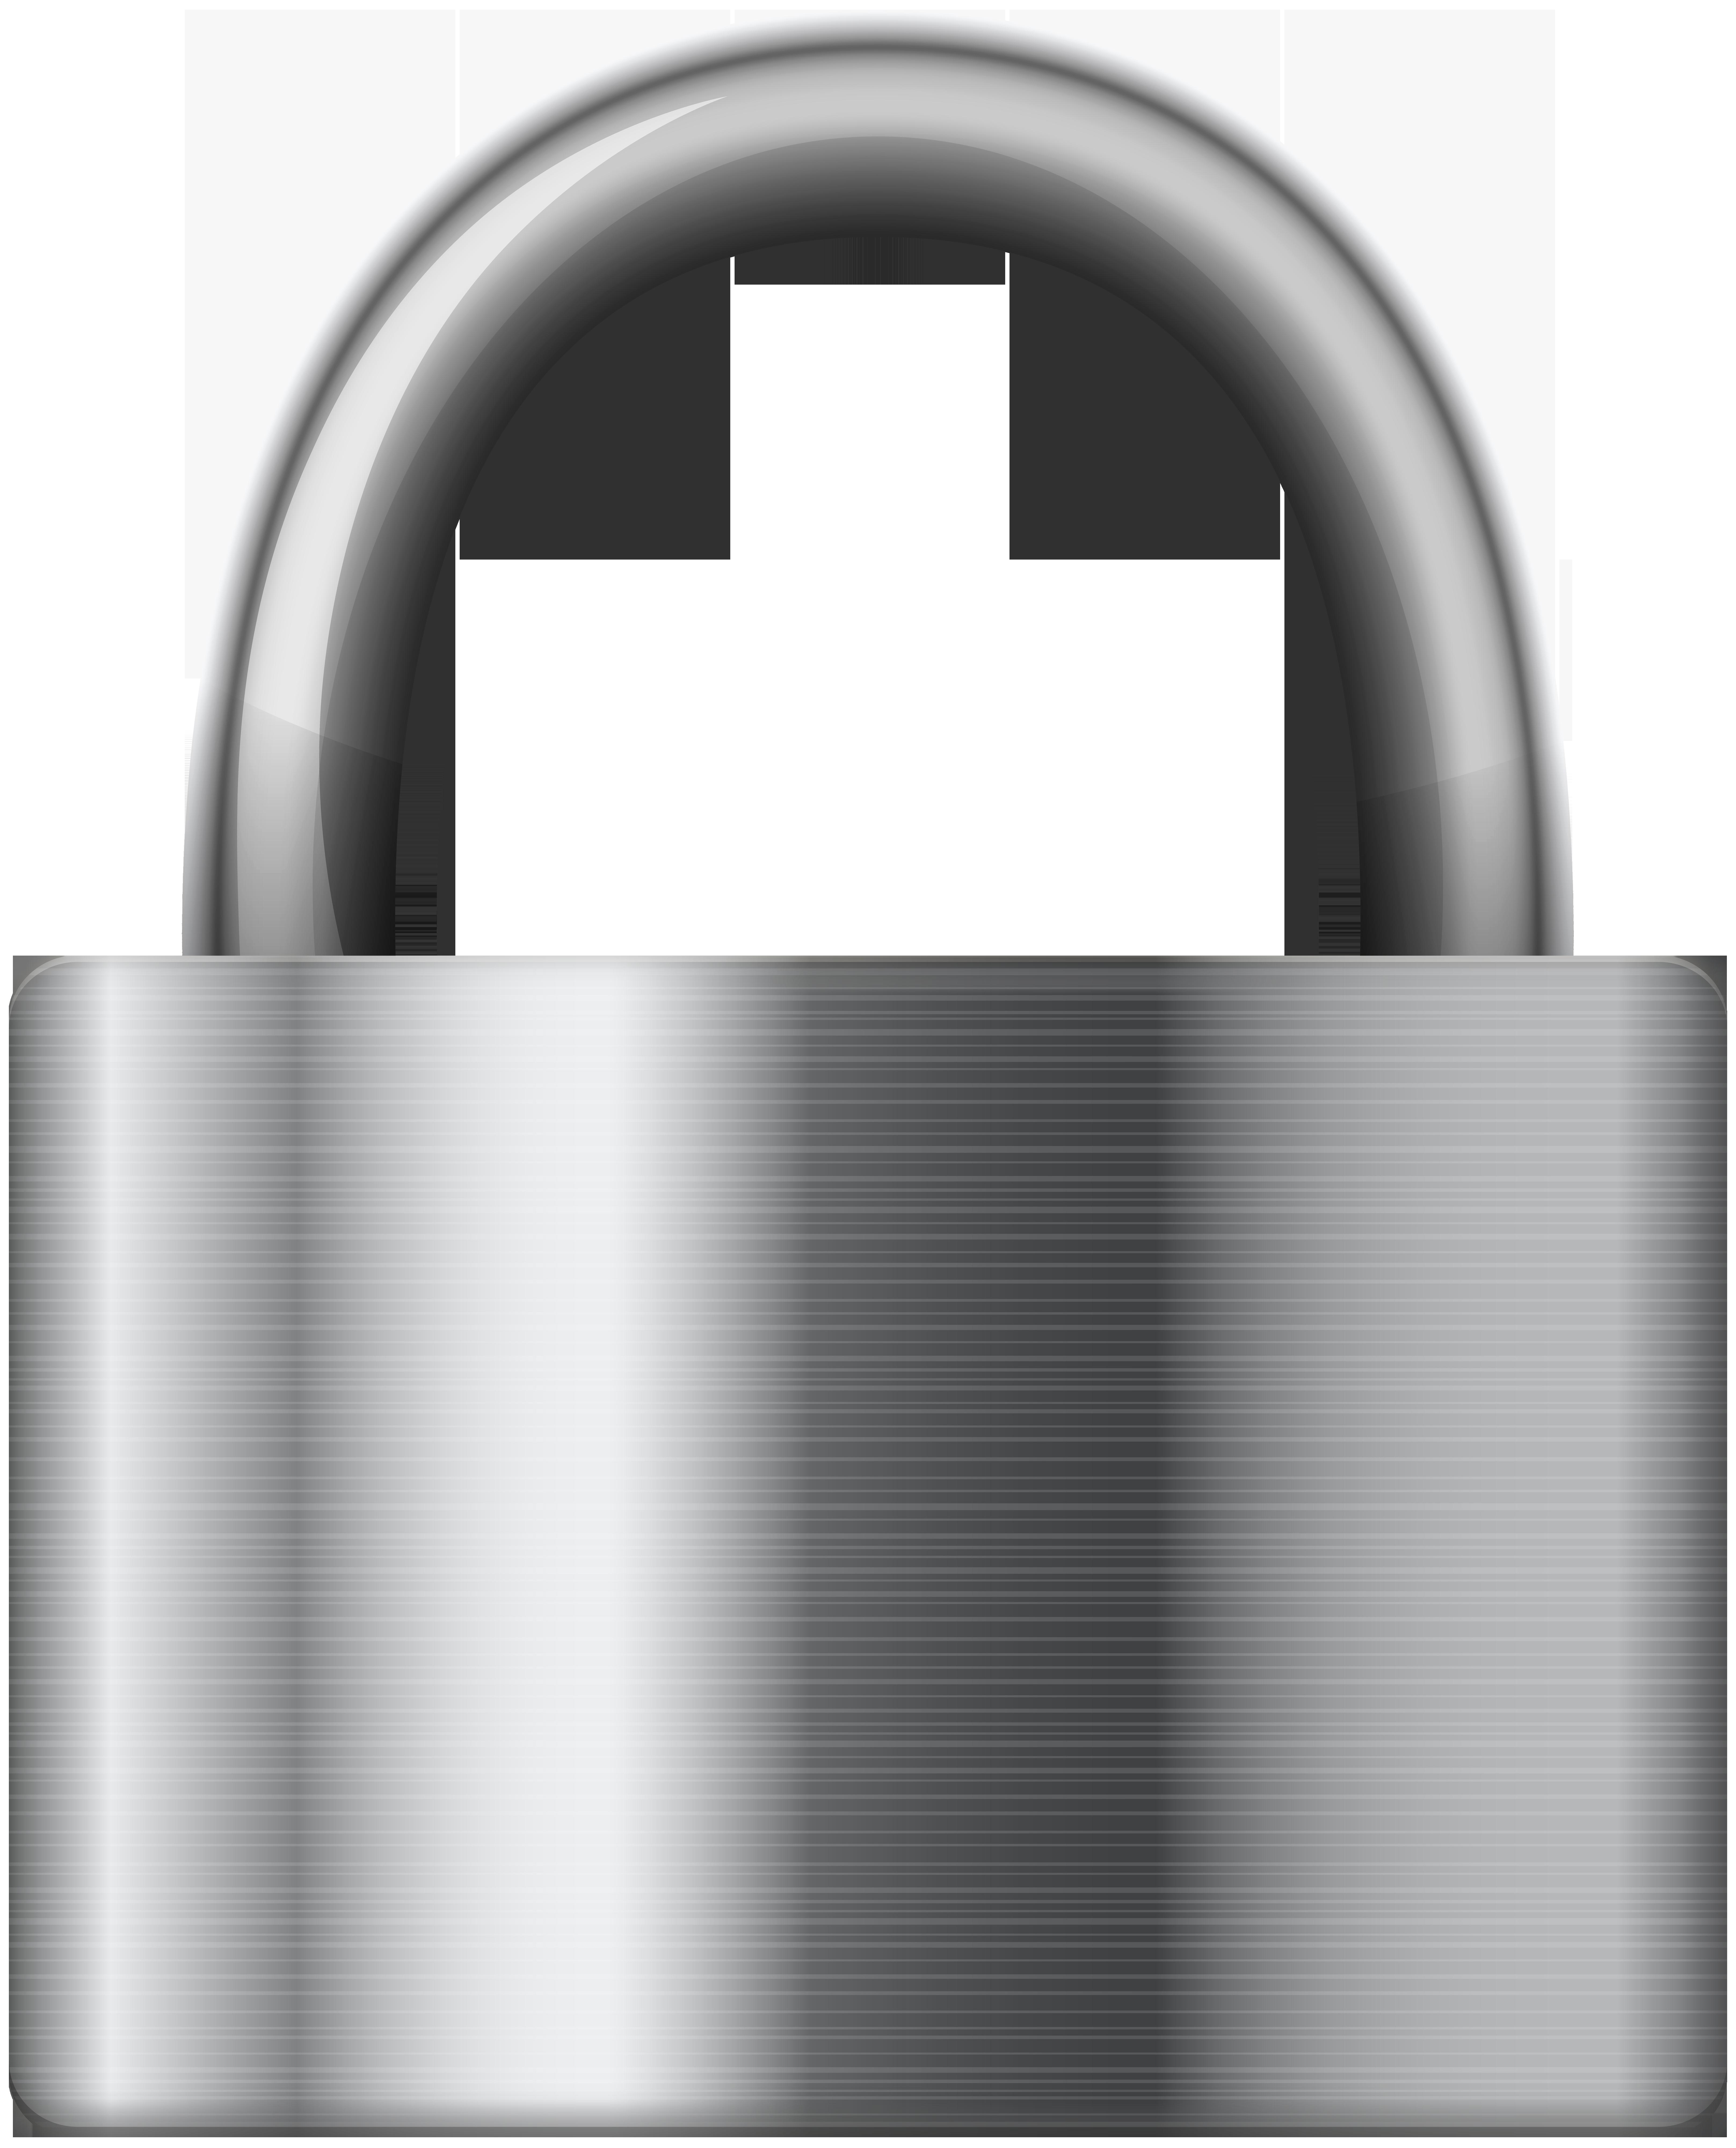 Lock clipart metal. Stainless steel iron padlock